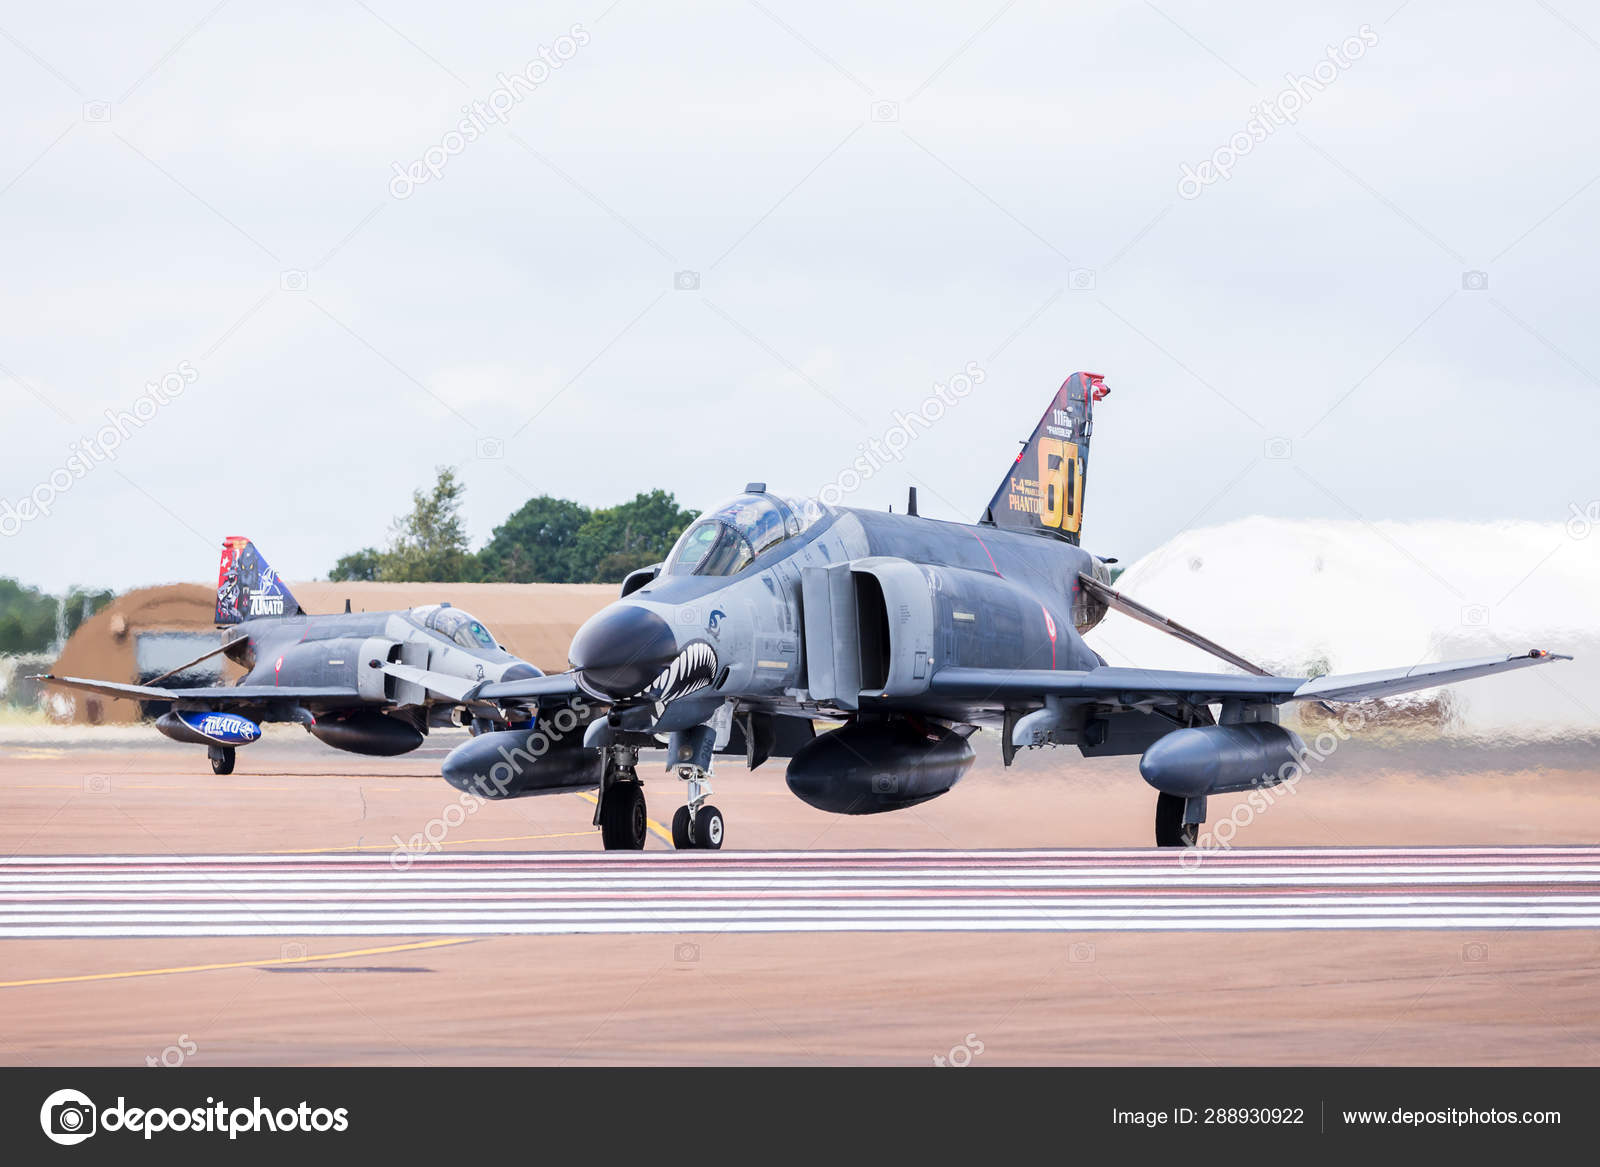 Westover Air Show 2020.Turkish Air Force 2020 Phantom Captured 2019 Royal